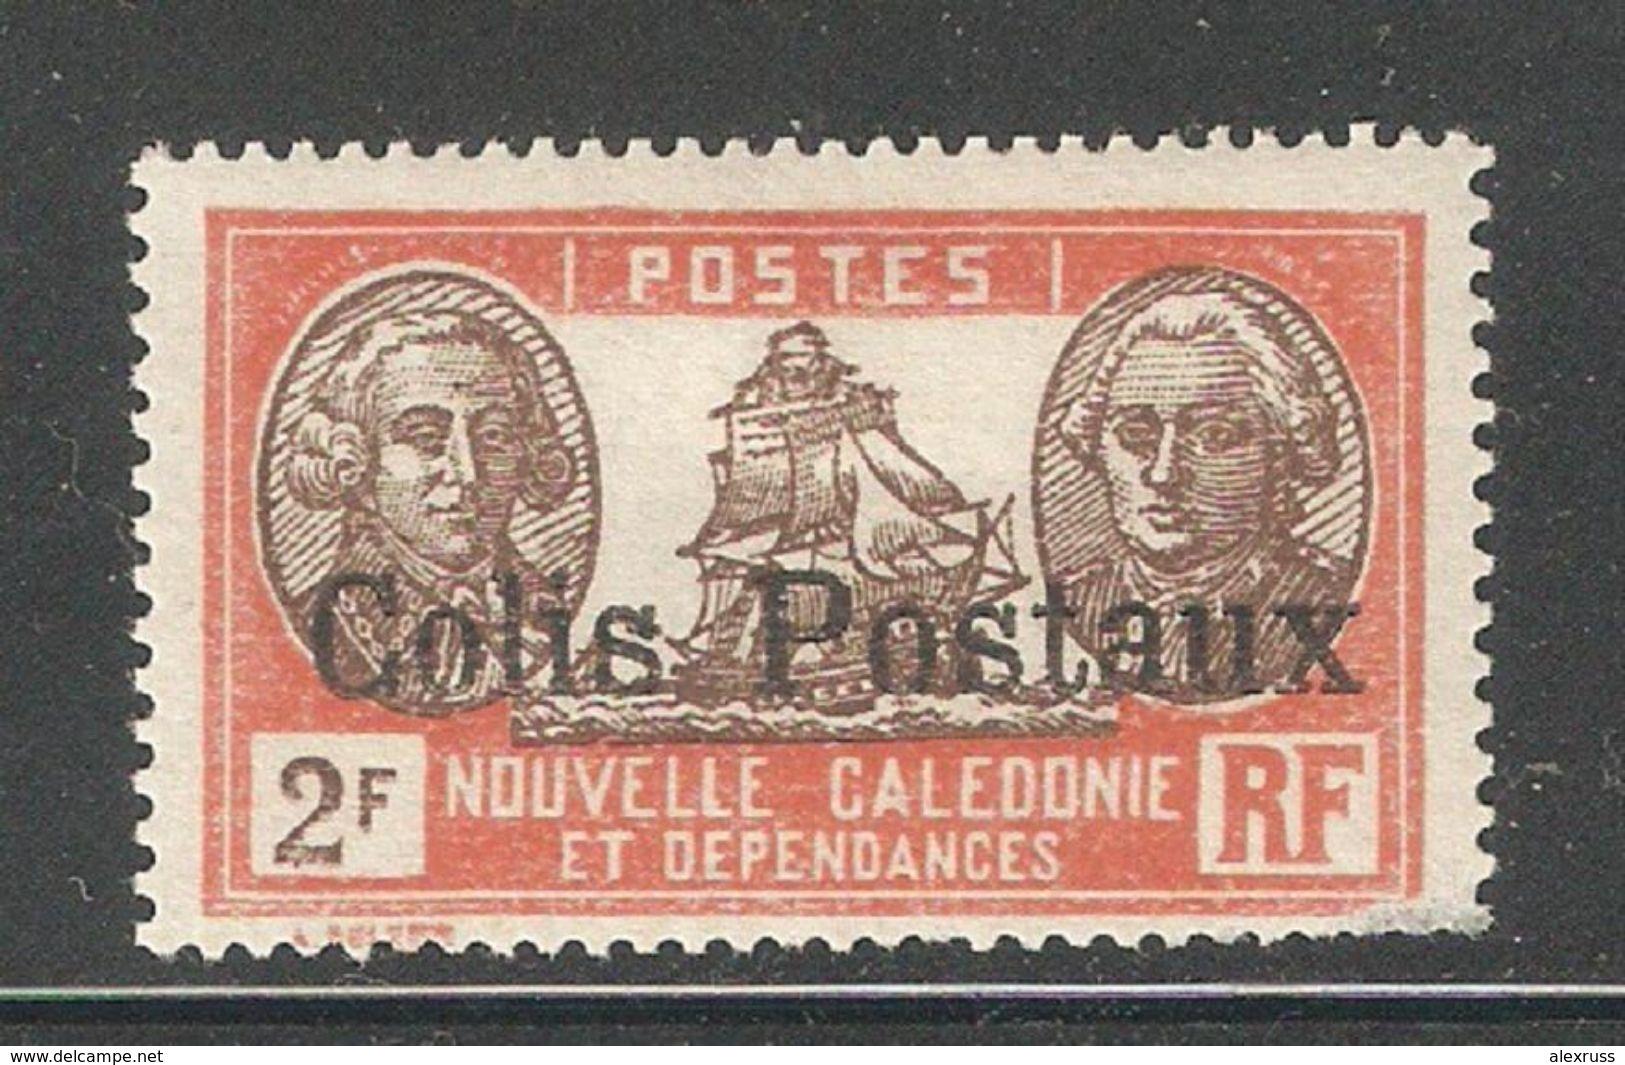 New Caledonia 1930,2fr Colis Parcel Post,Sc Q6,Fine Mint Hinged* (K-8) - New Caledonia